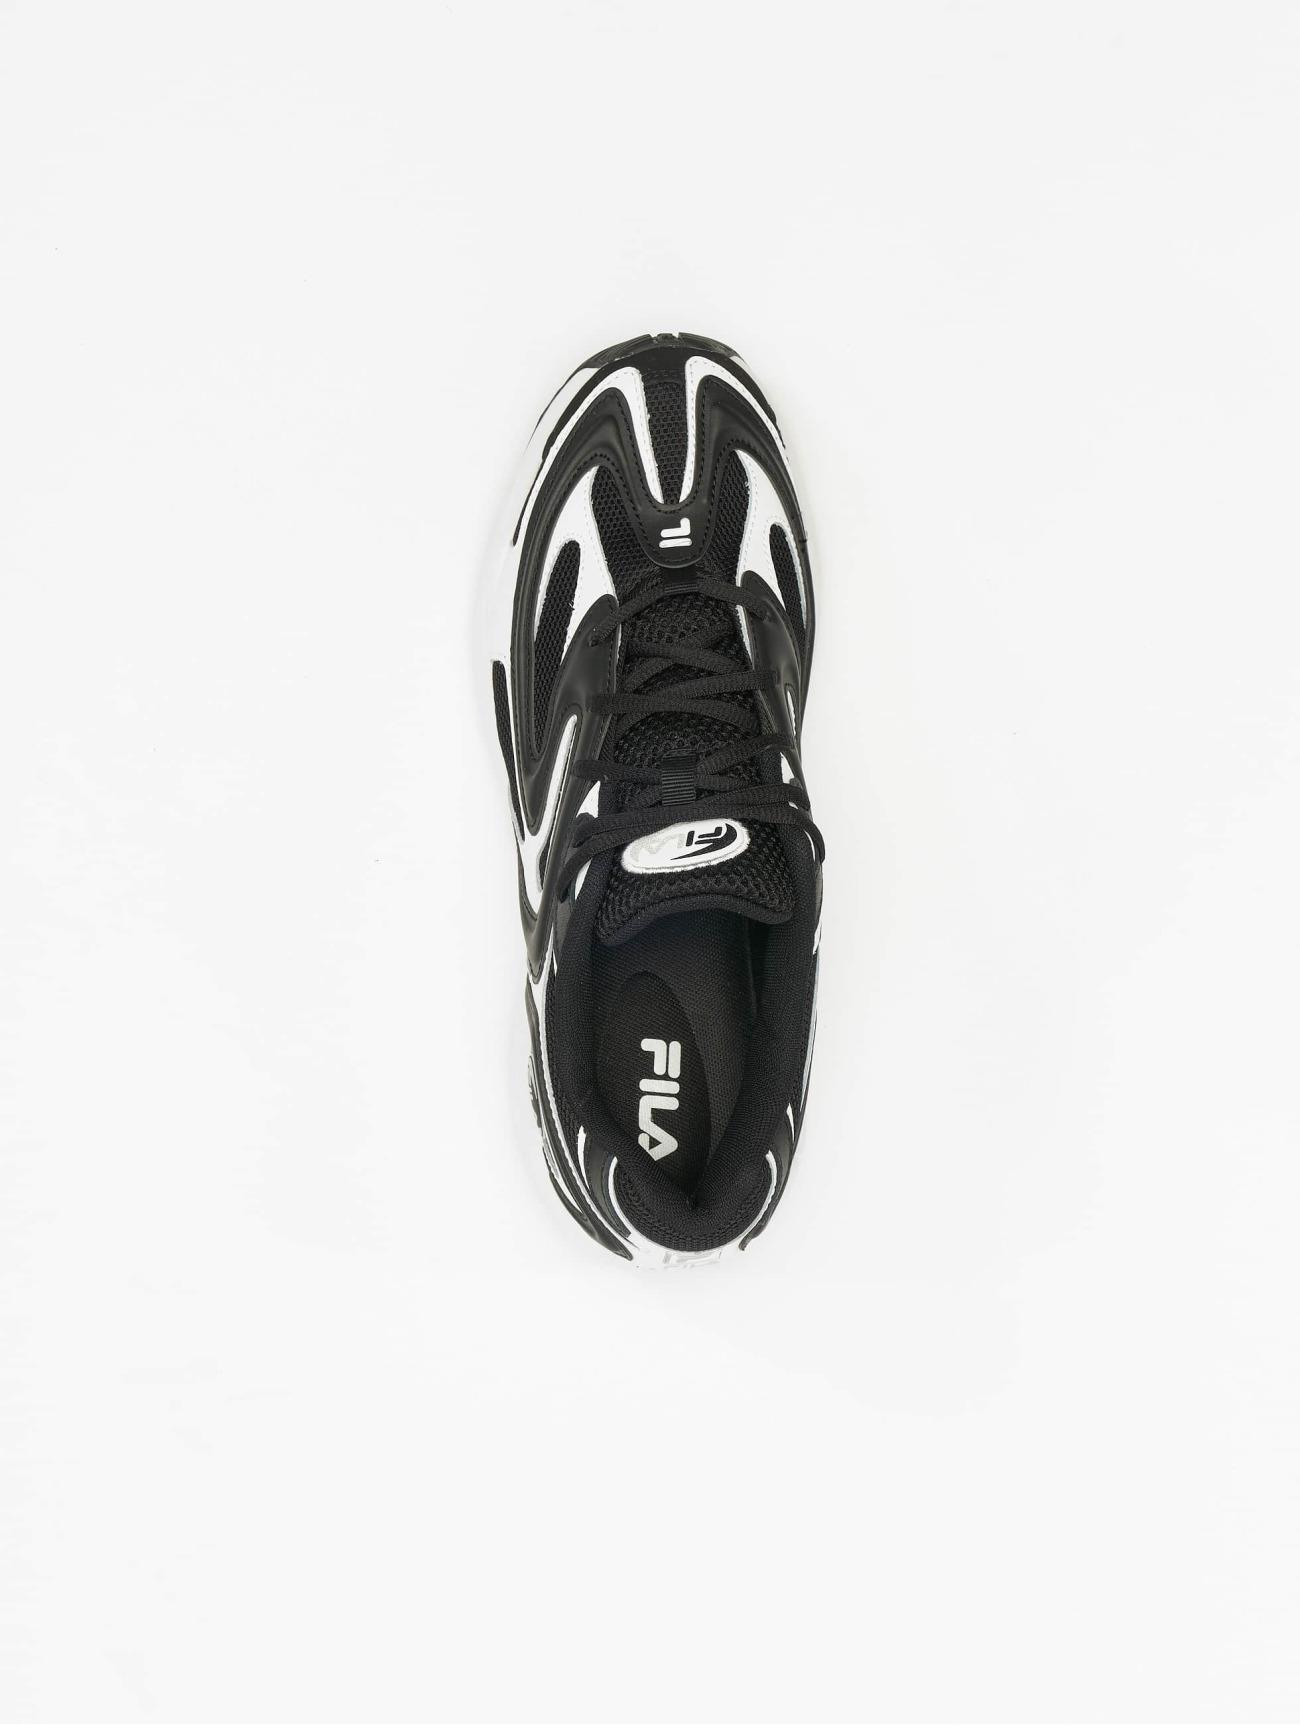 FILA  Heritage Buzzard  noir Homme Baskets  646345 Homme Chaussures